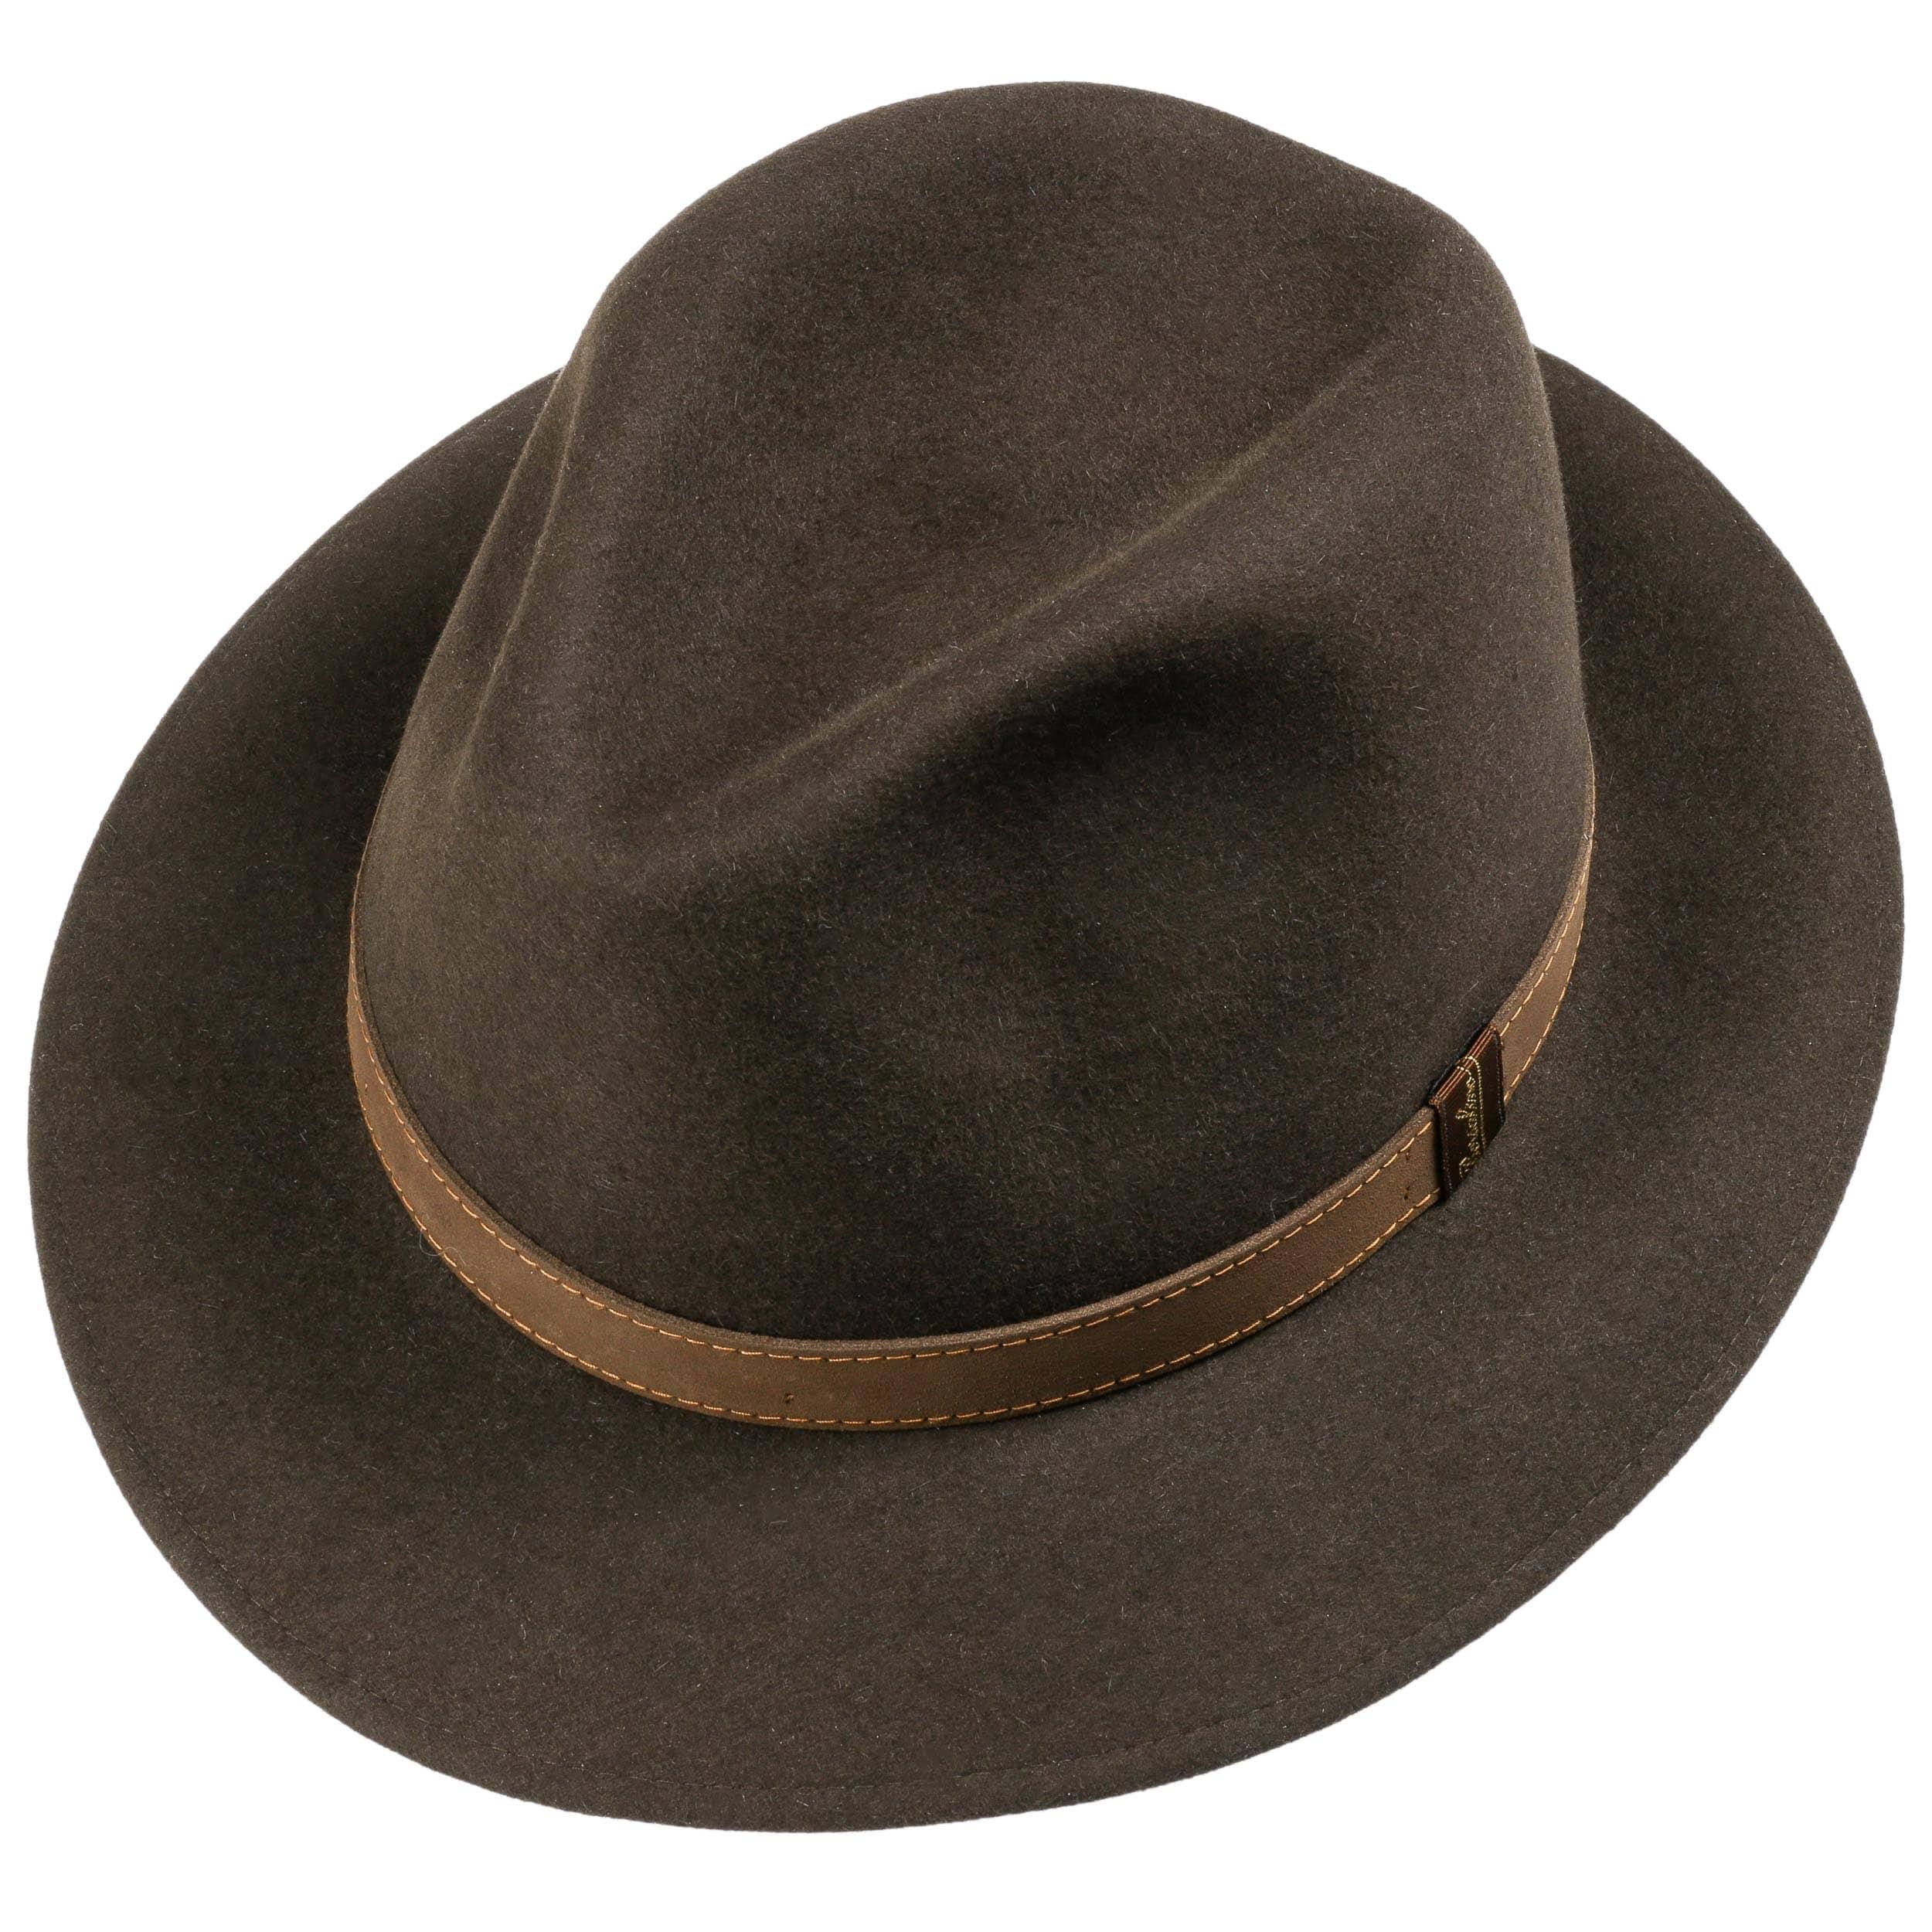 02b319cc7f0 Traveller Marrone Hat by Borsalino - brown 1 ...